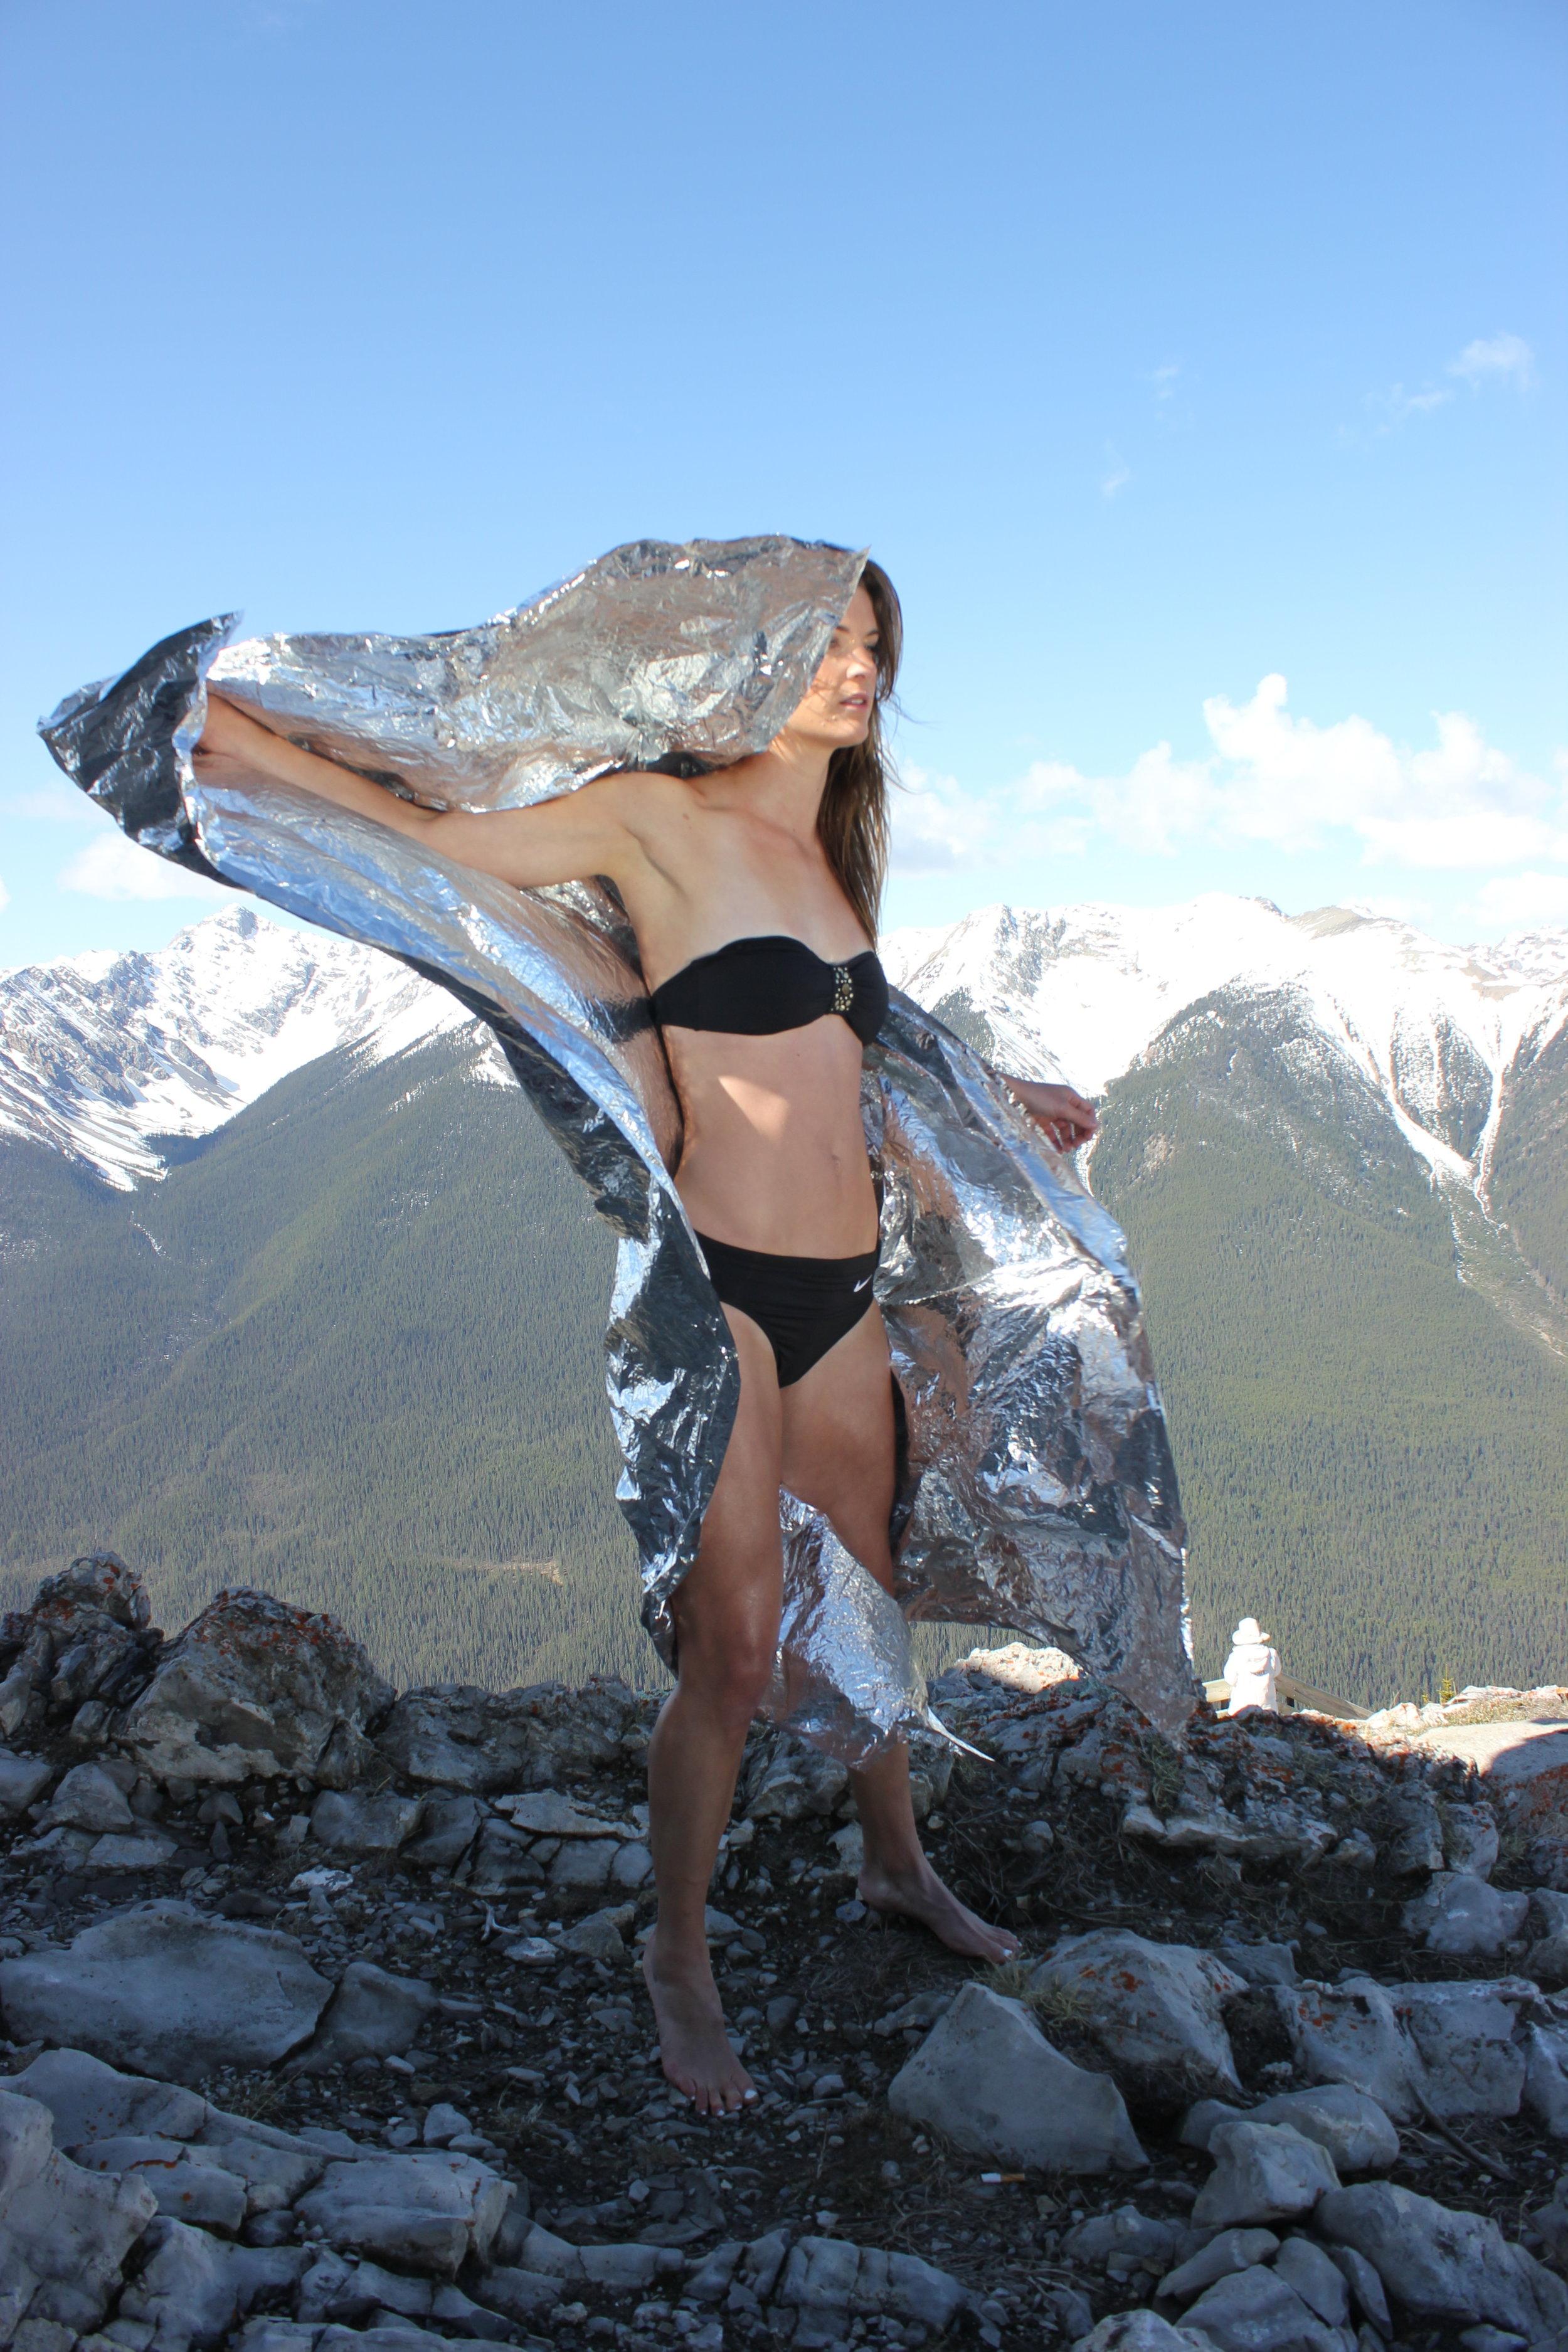 Mountain top props and Javelin athlete Rachel Machin. Banff, Alberta, Canada